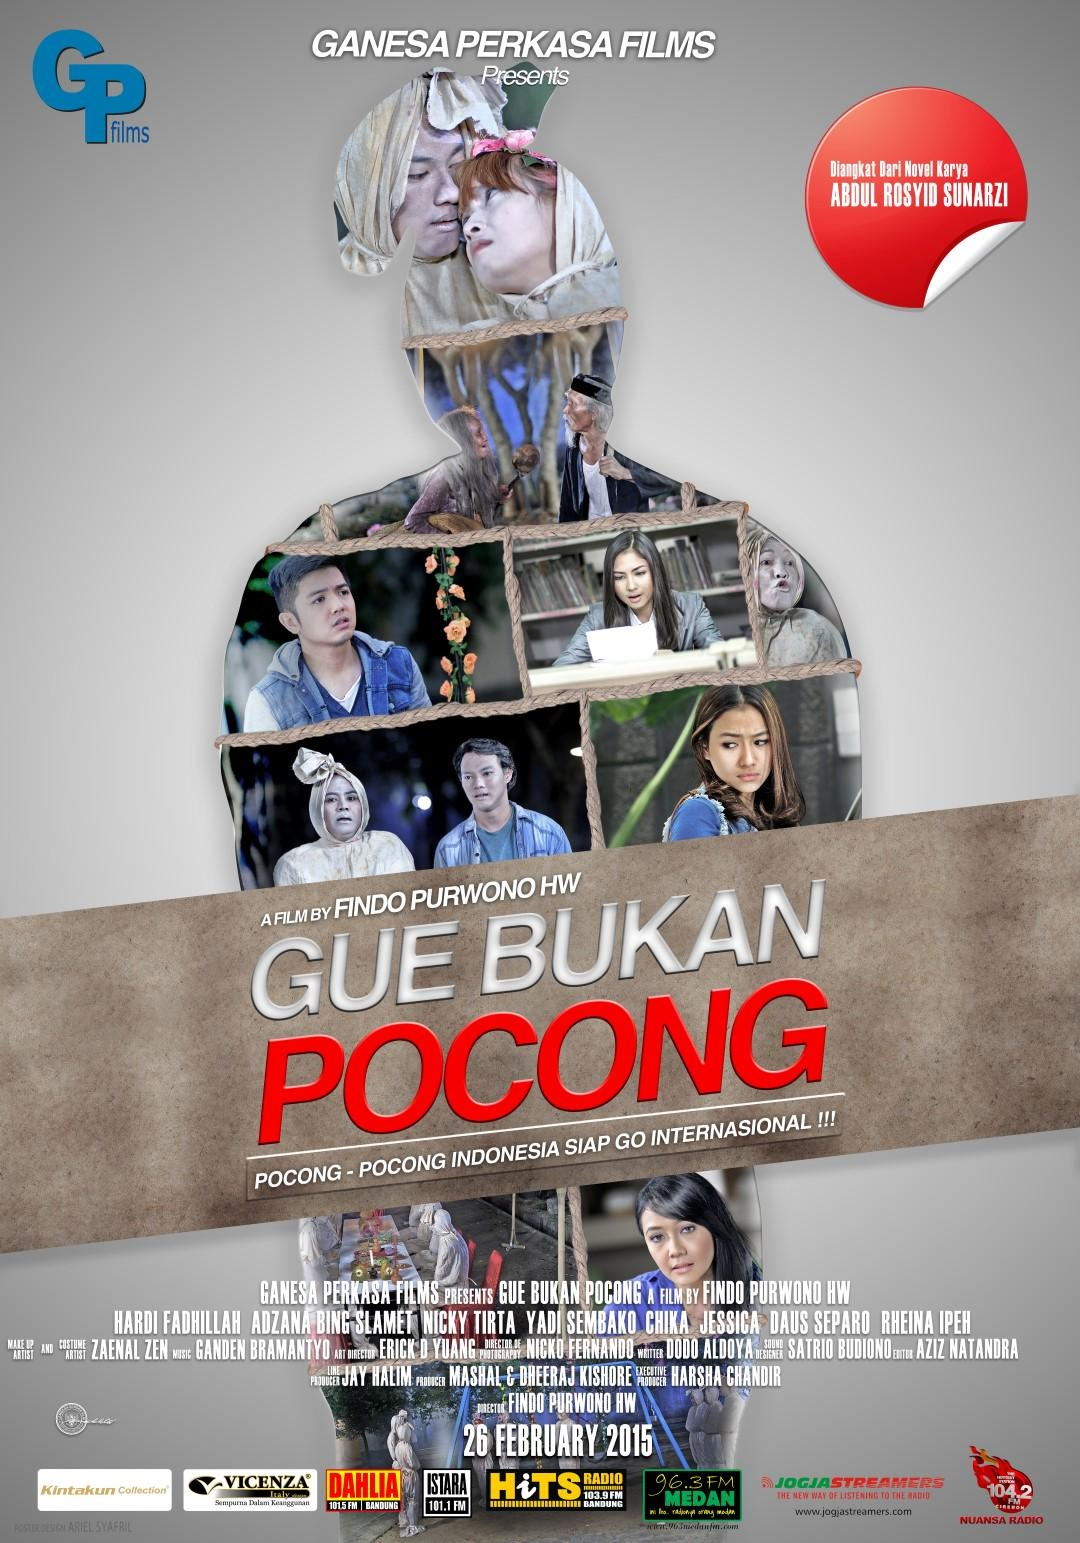 Gue Bukan Pocong (2015)